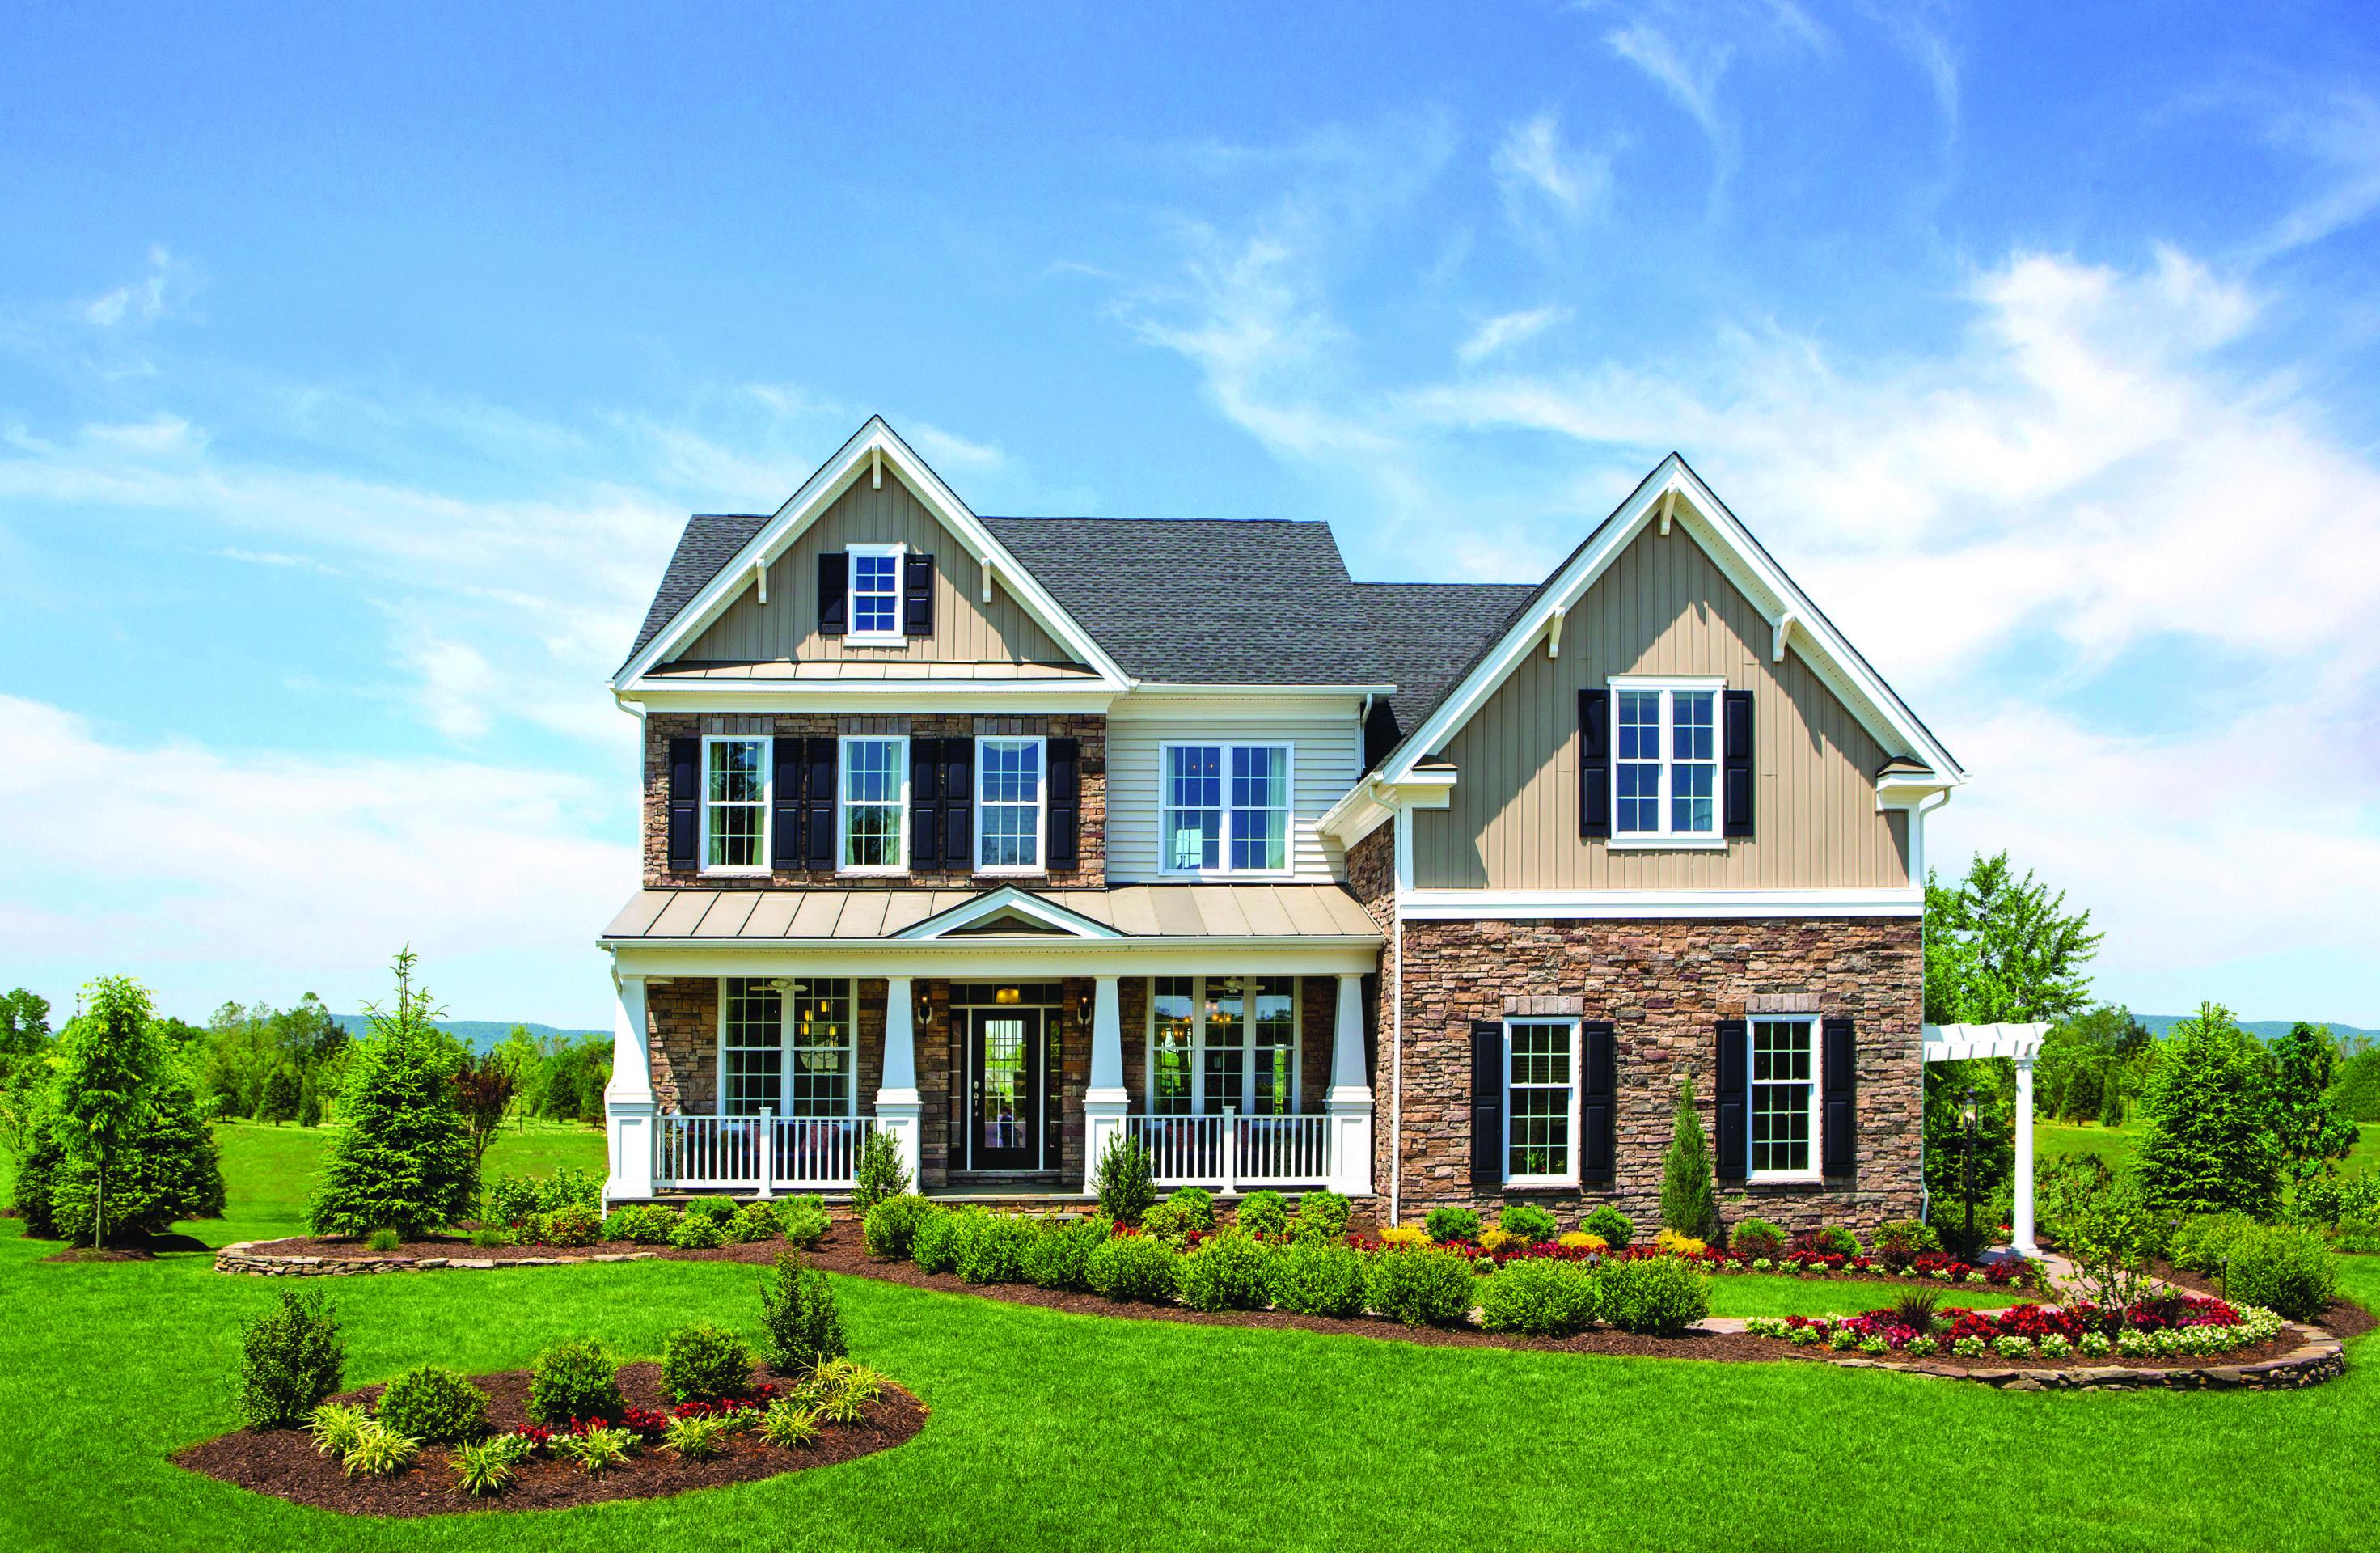 Home Design Elements Virginia Part - 34: Pinterest